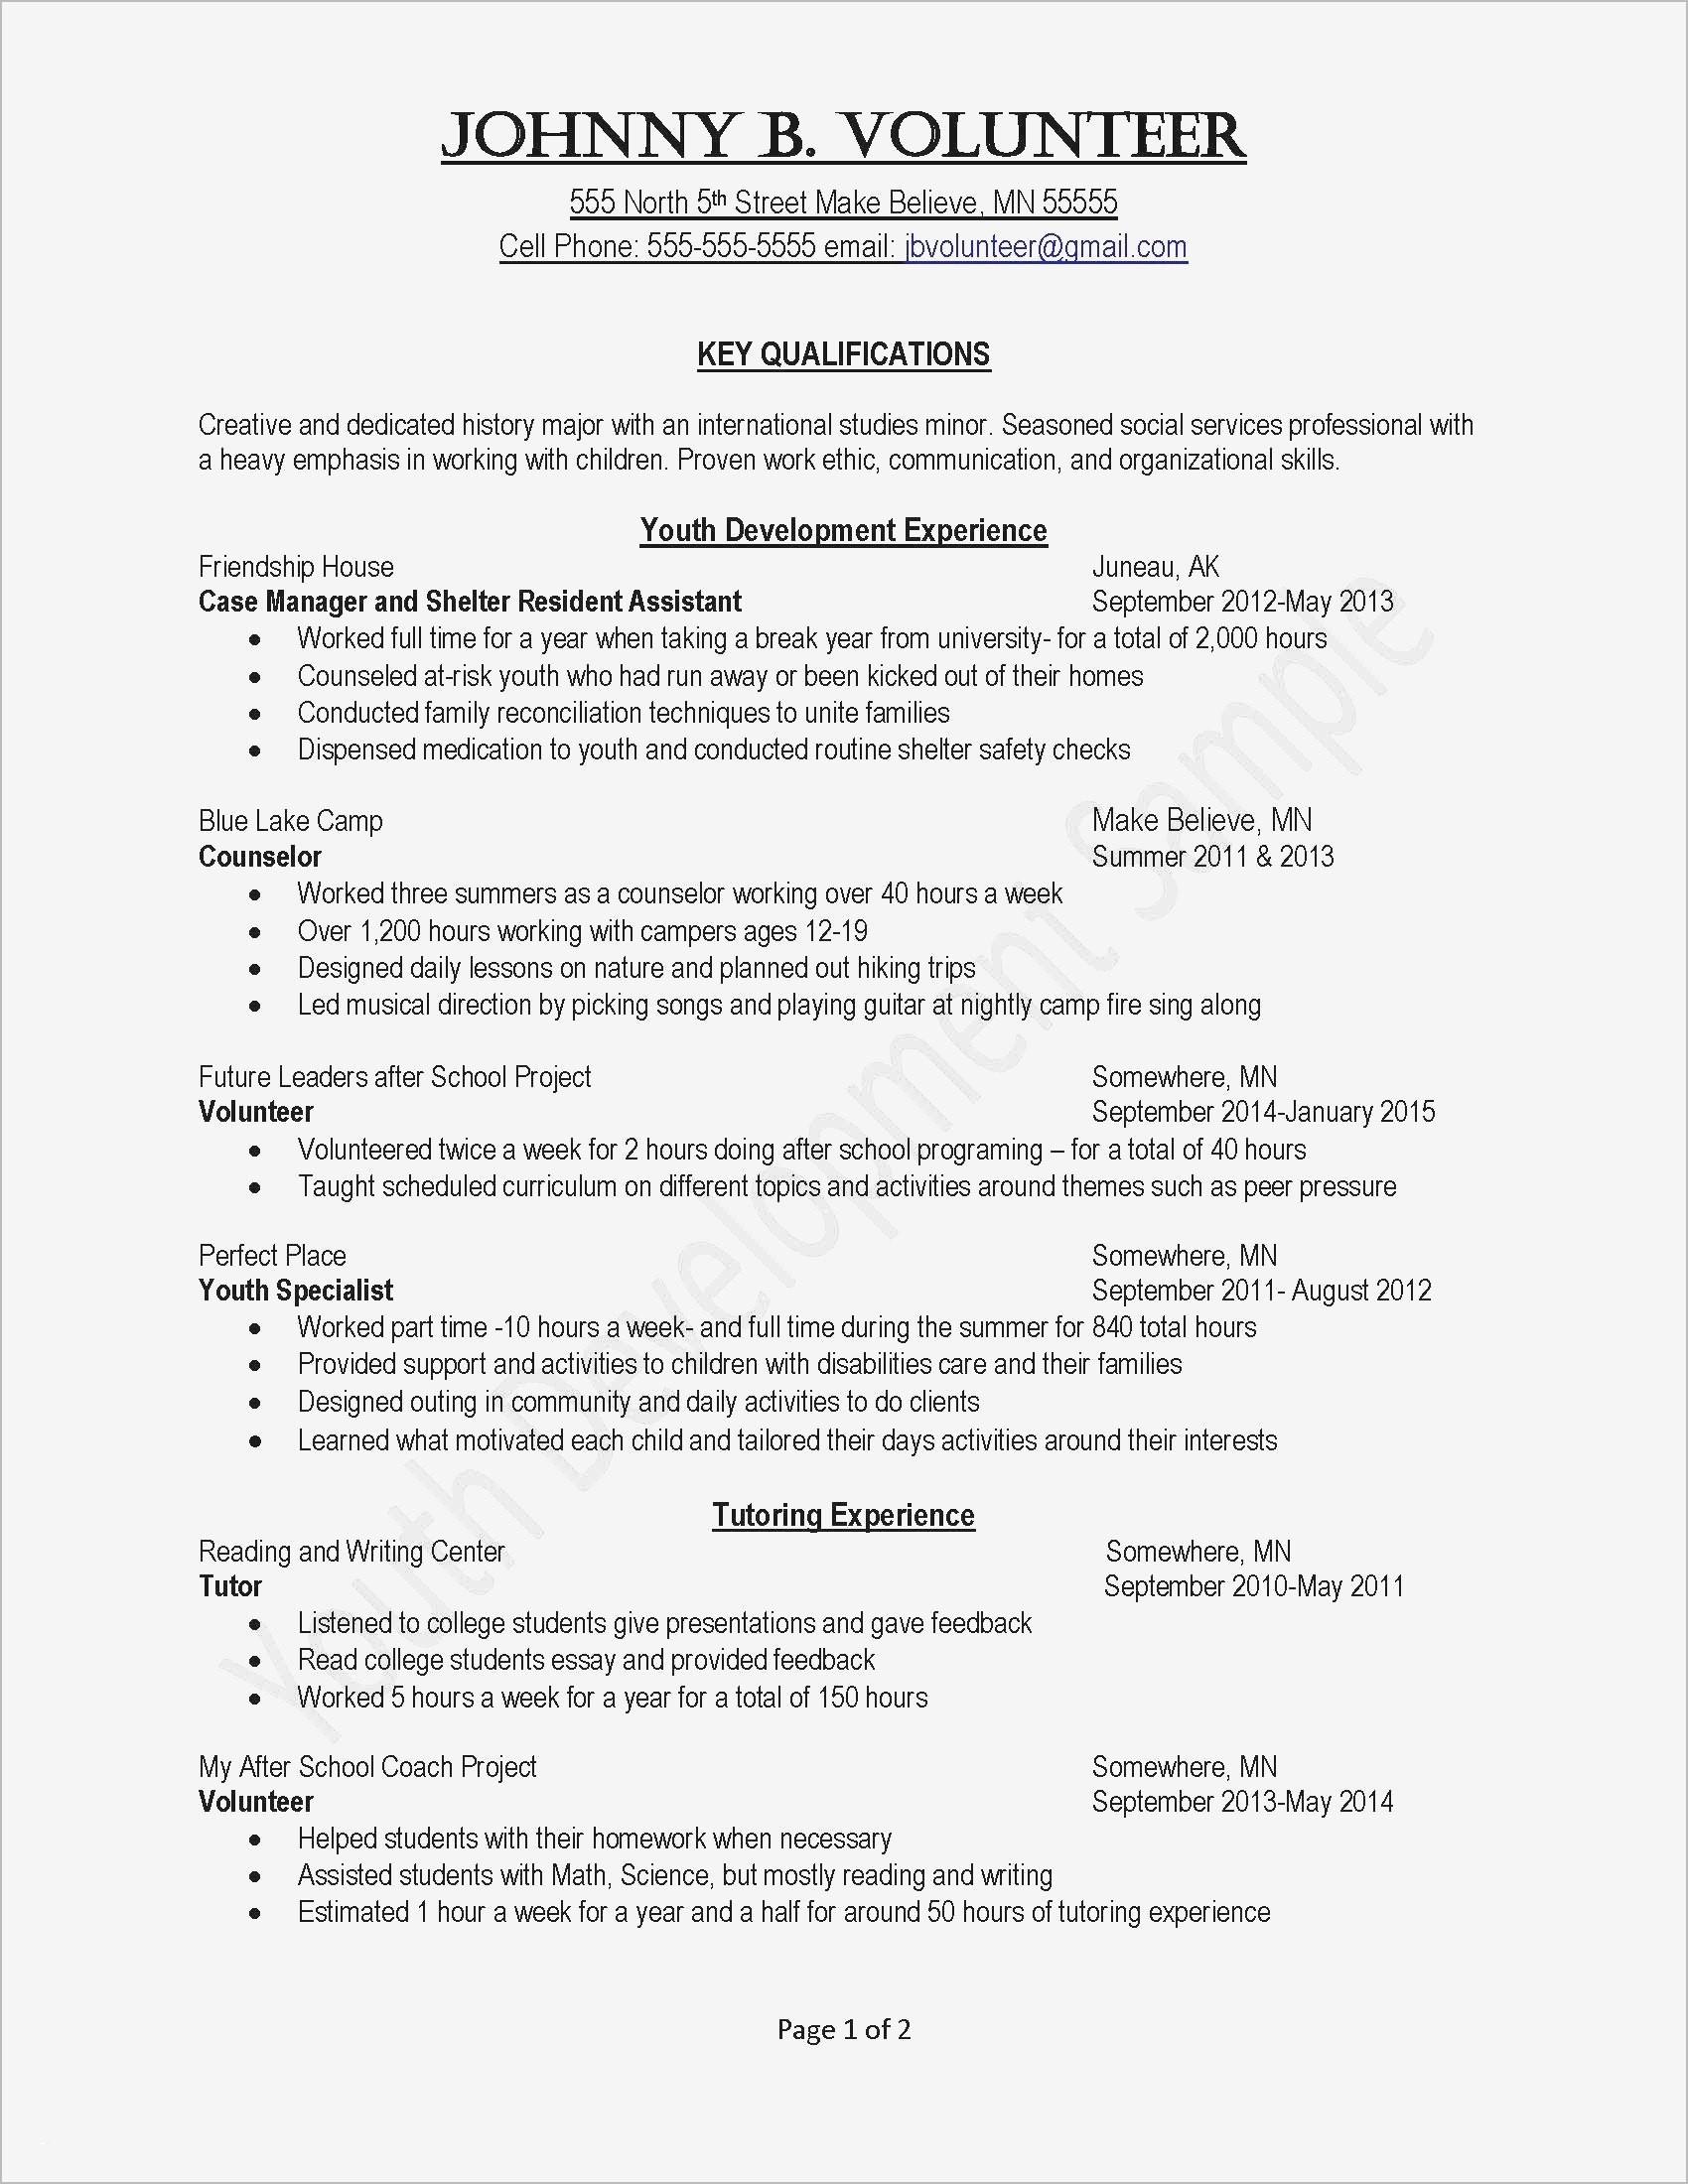 Fresh Free Printable Resume Templates Microsoft Word - Vcuregistry - Free Printable Lock Pick Templates